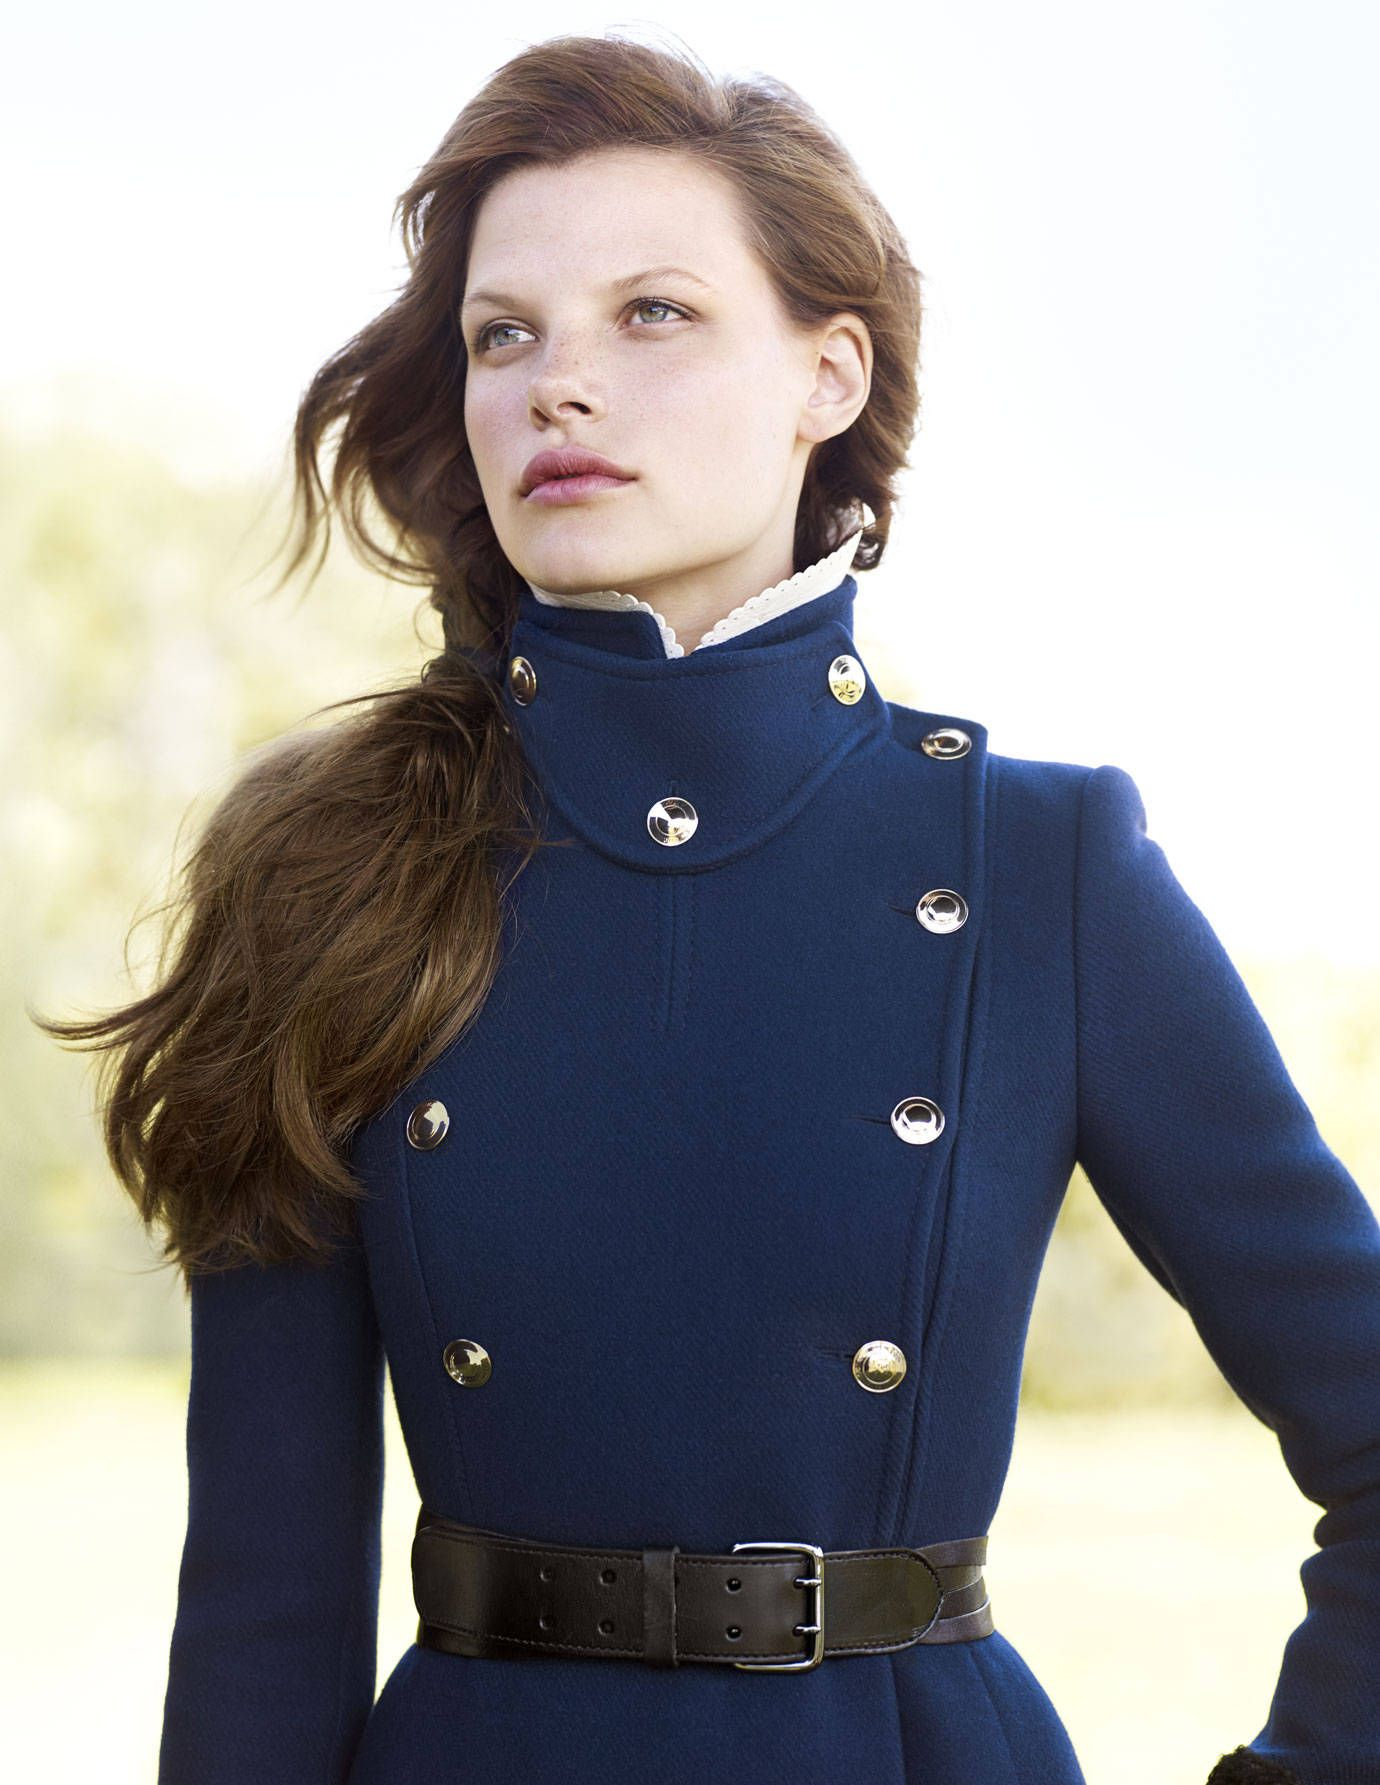 Equestrian-Inspired Fashion